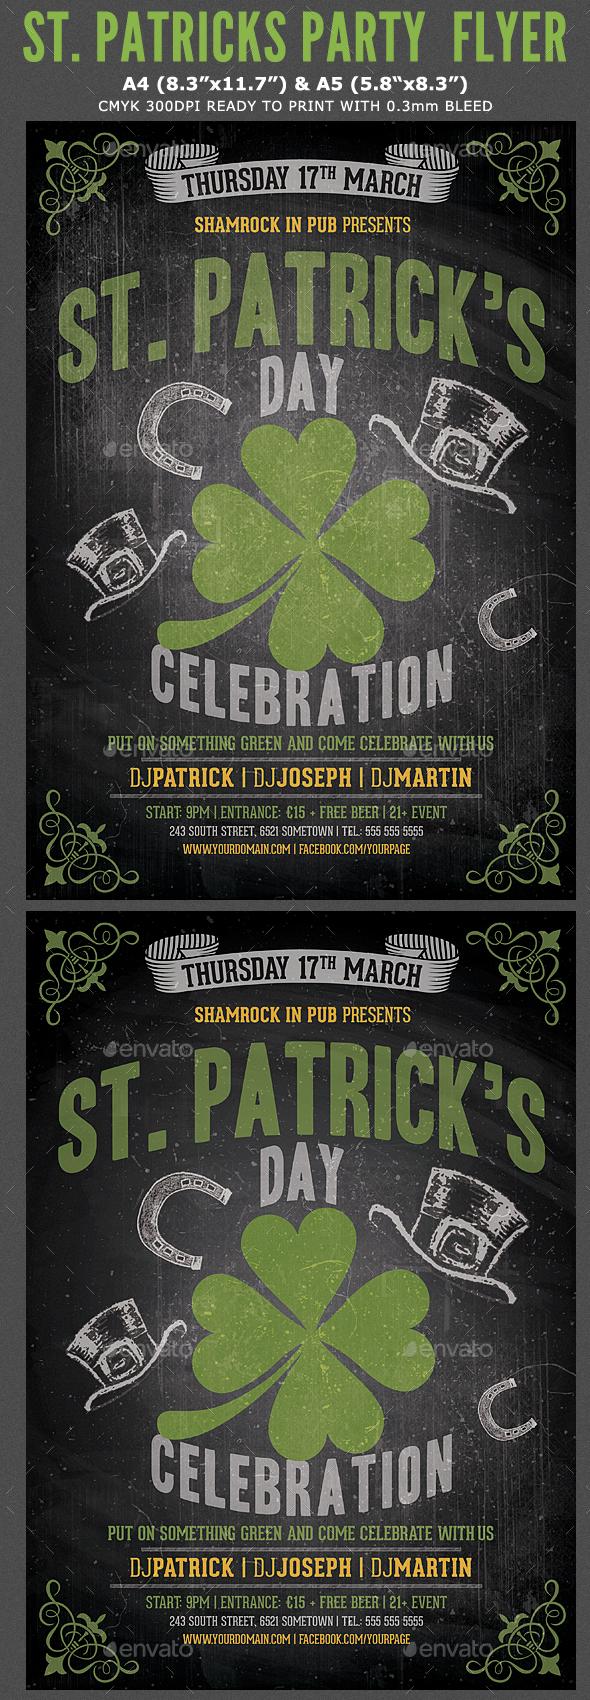 Saint Patrick's Party Flyer Template - Events Flyers